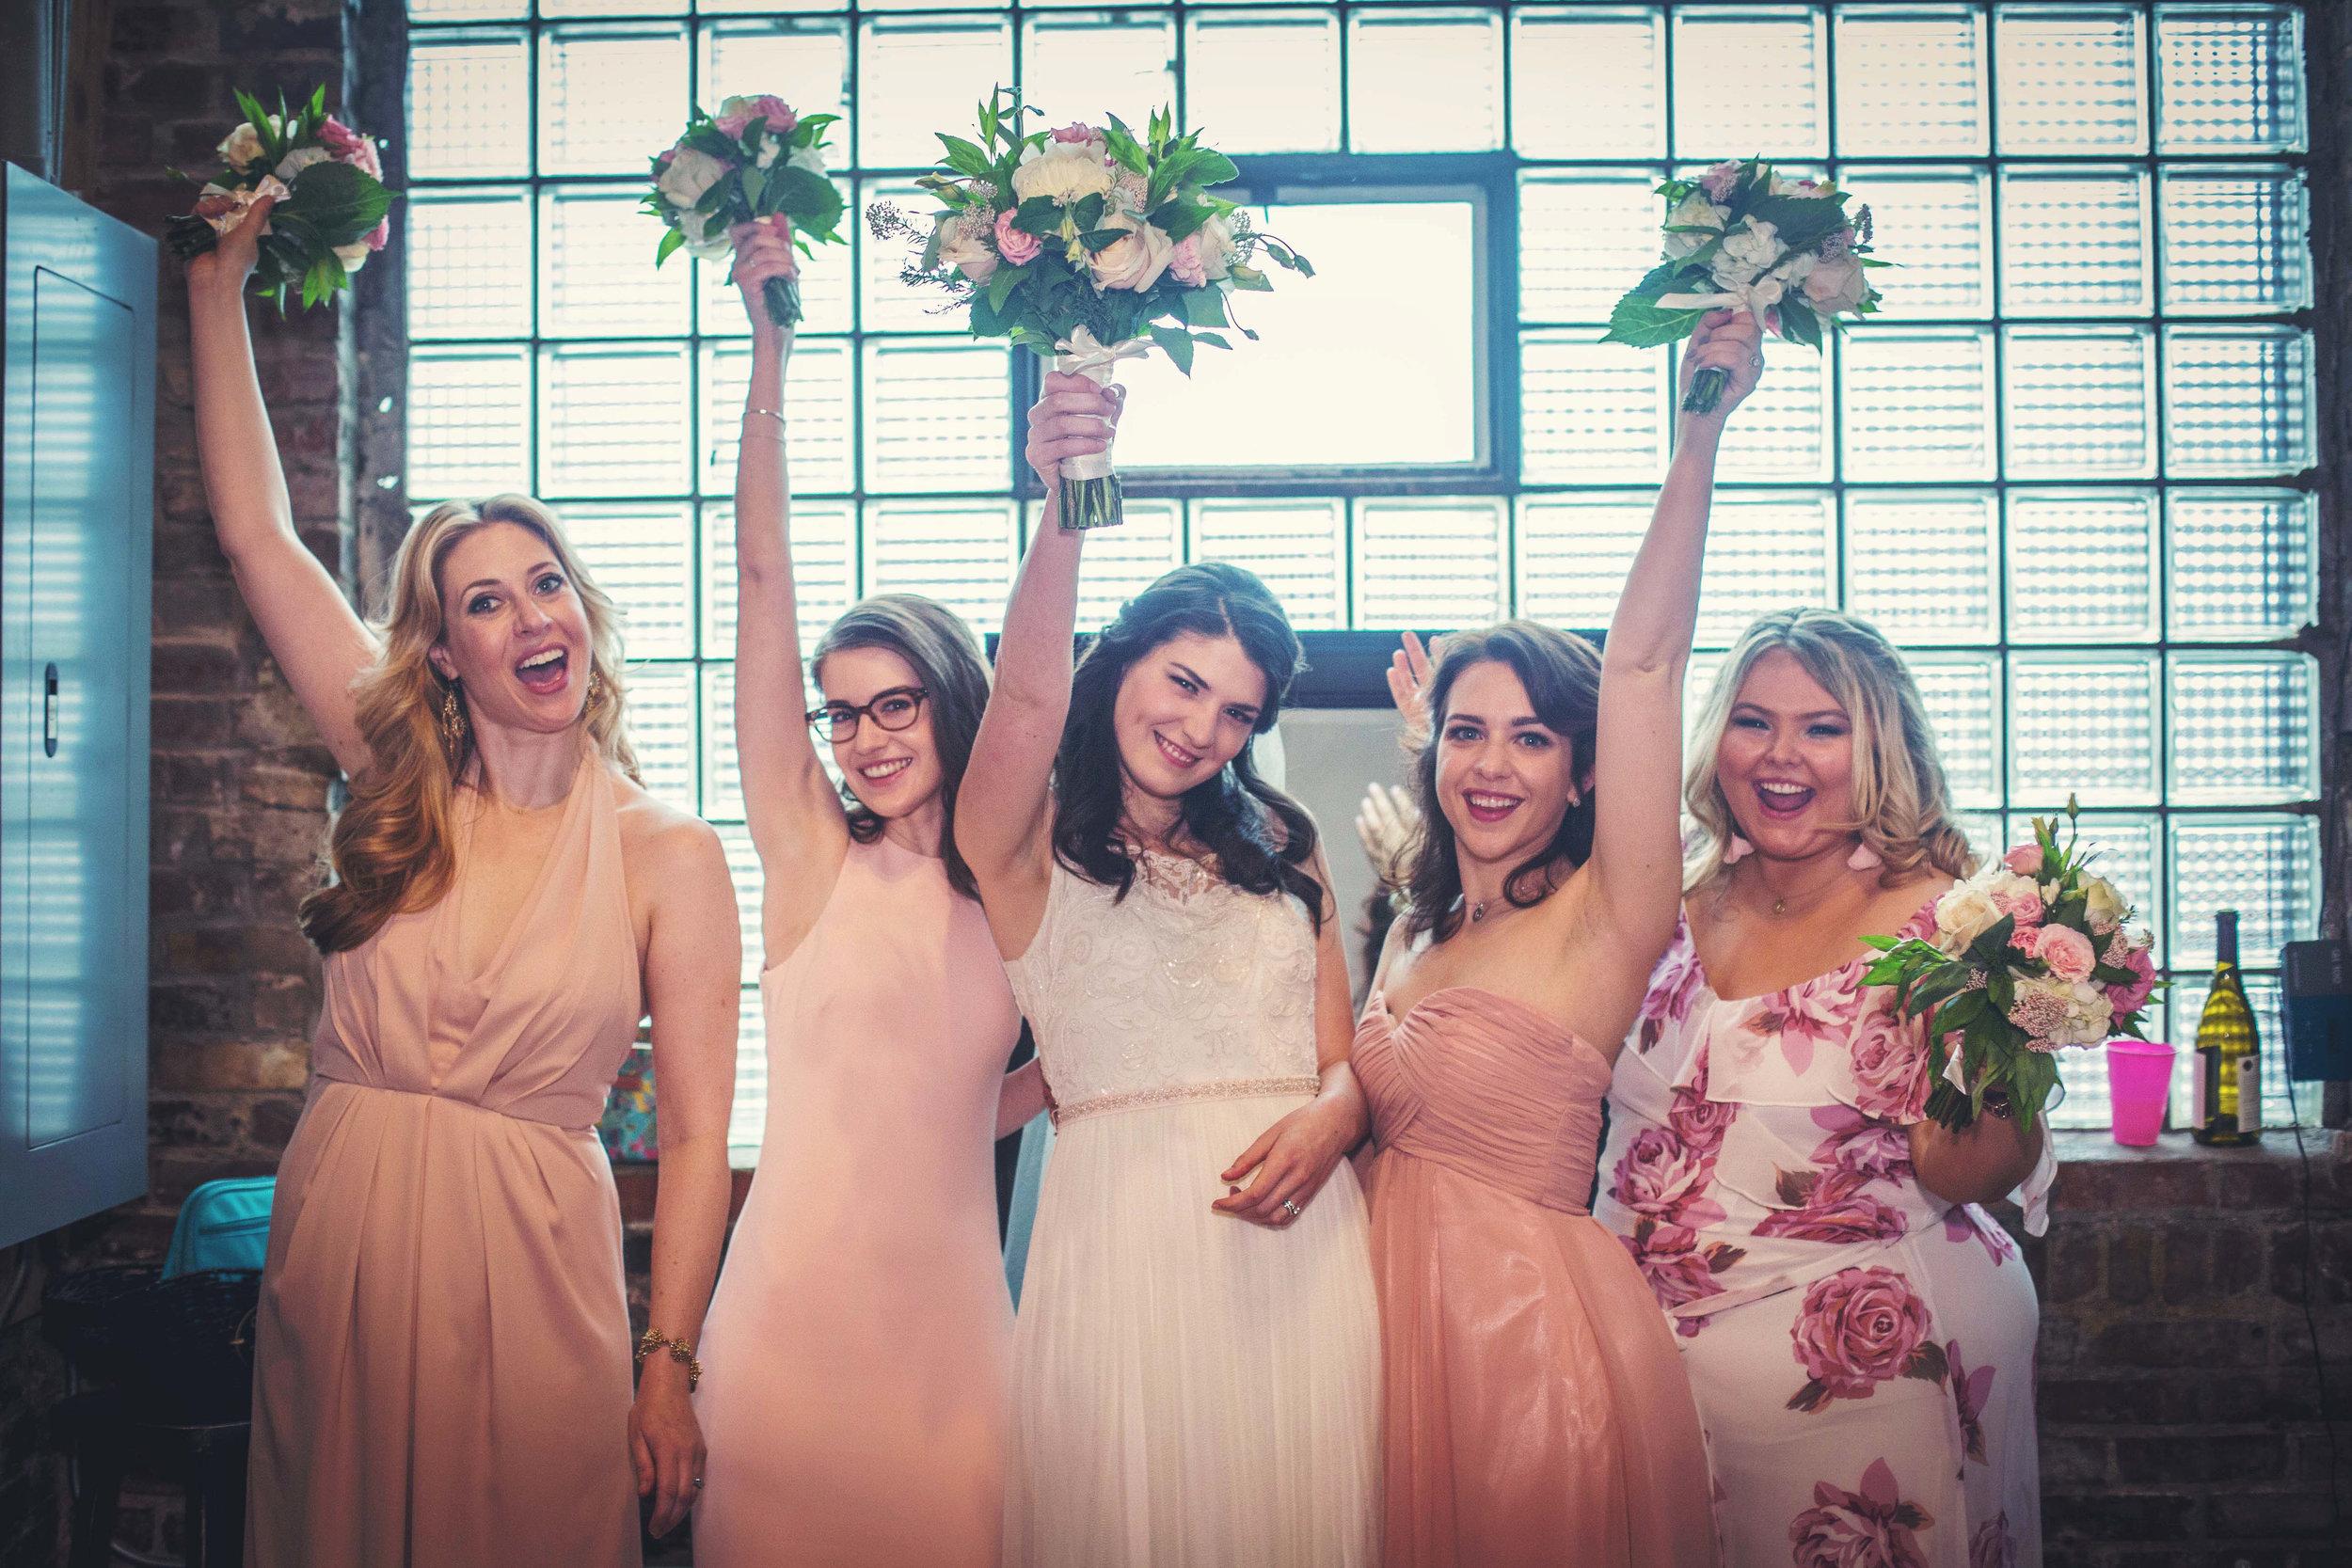 Kansas+City_Small+Wedding_Elope_Intimate_Ceremony_Best+Friends_Kaite&Austin20170429-122b.jpg